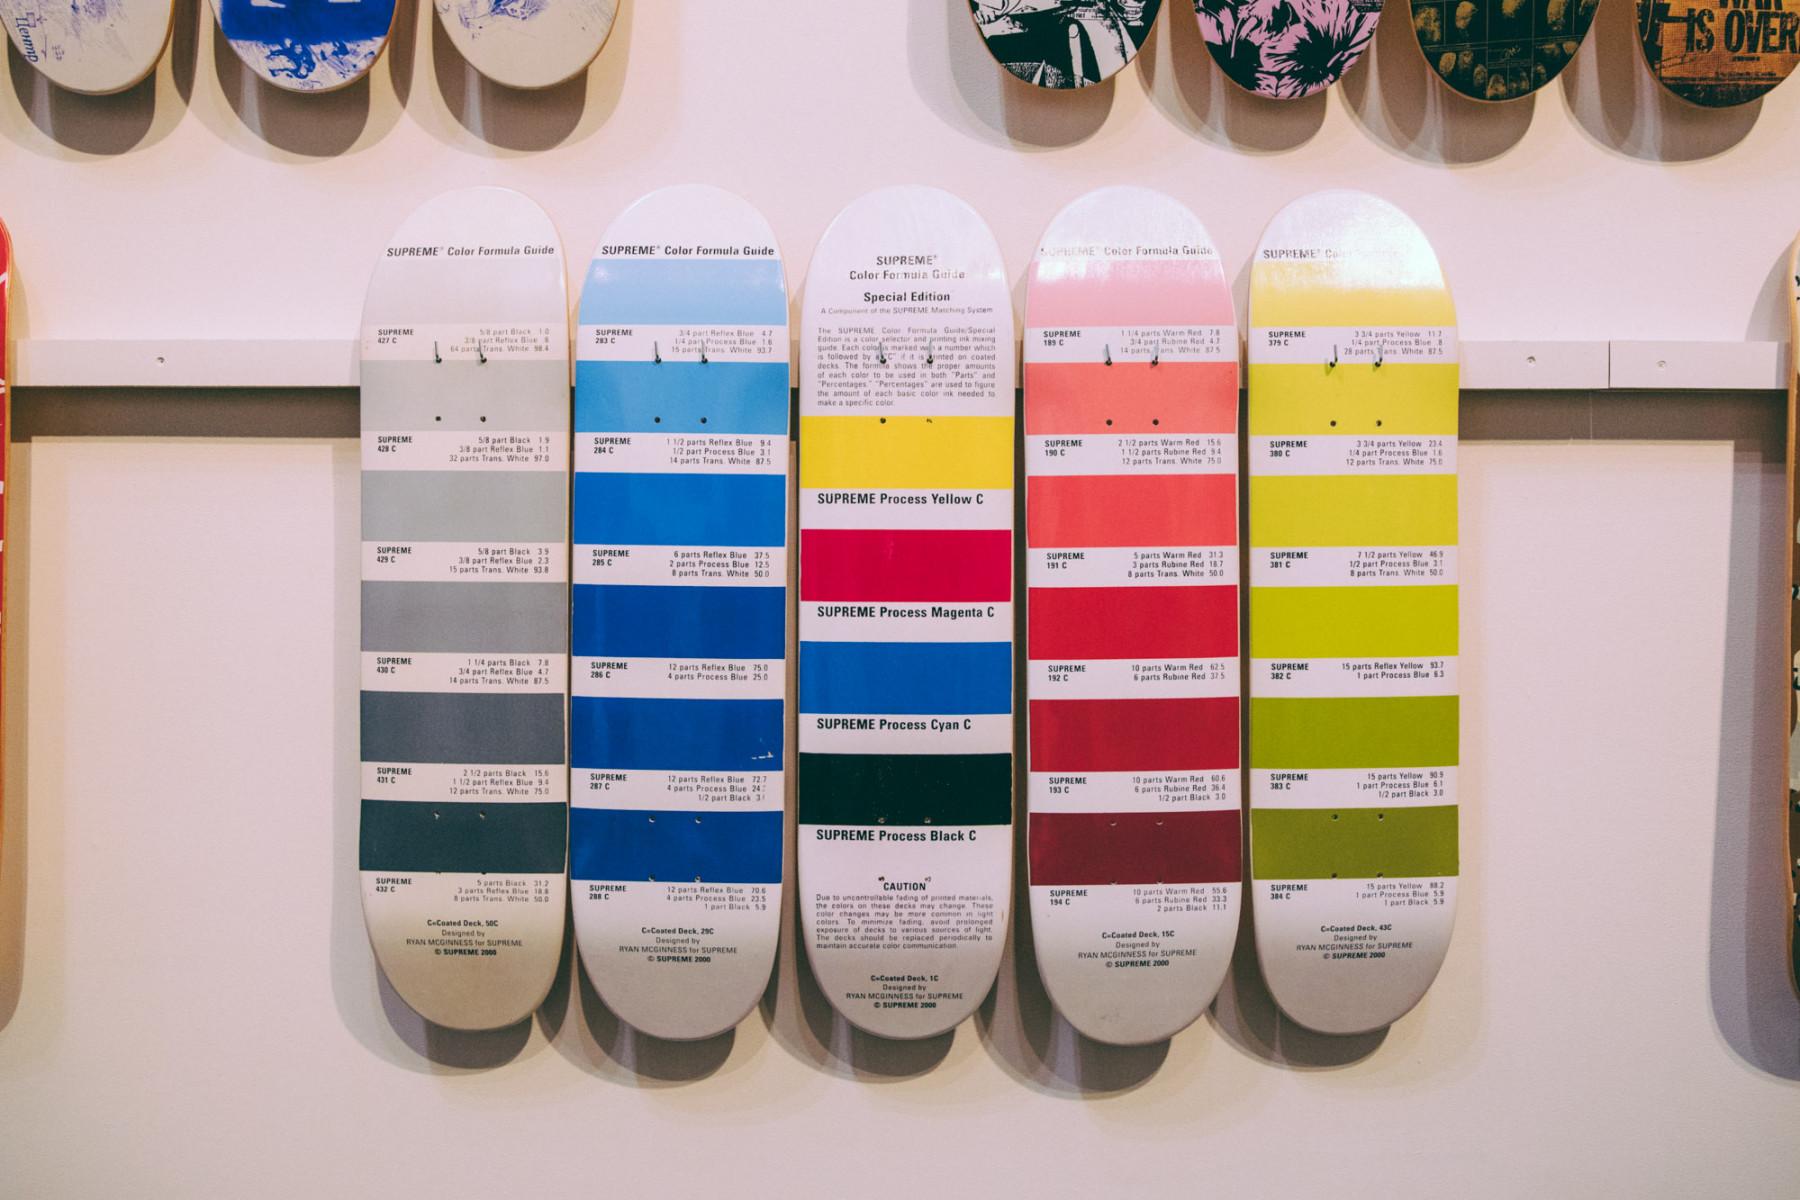 Sothebys-Supreme-Skate-Decks-9-1800x1200